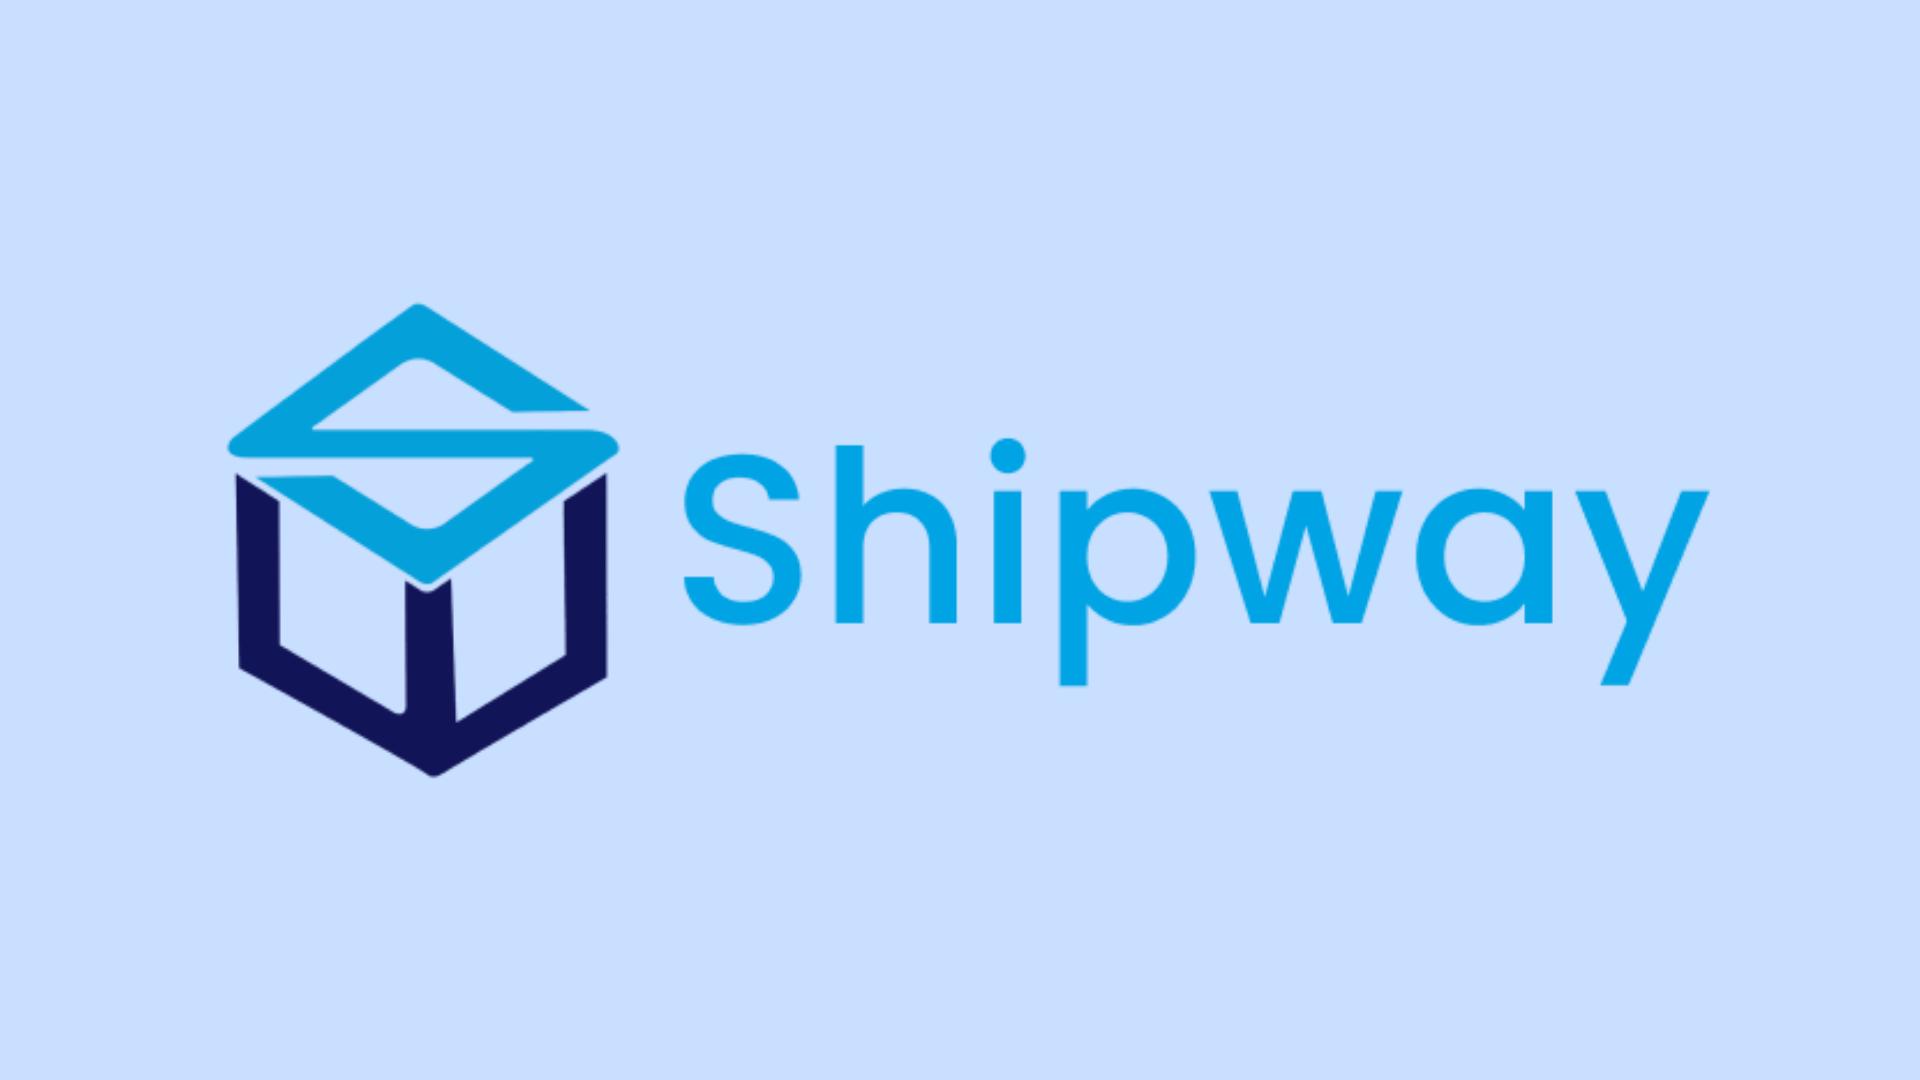 Shipway Tracking App